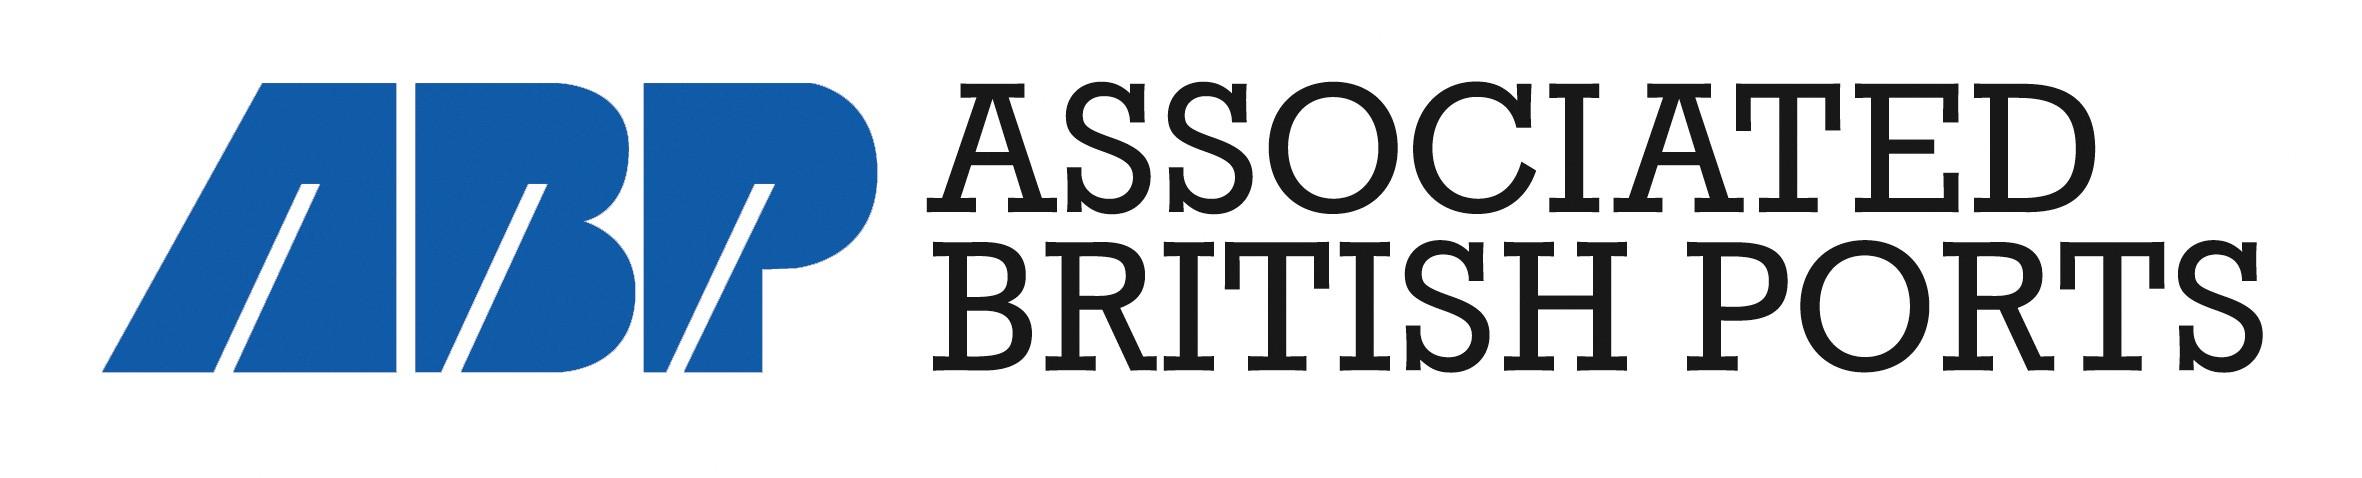 ABP_logo.jpg